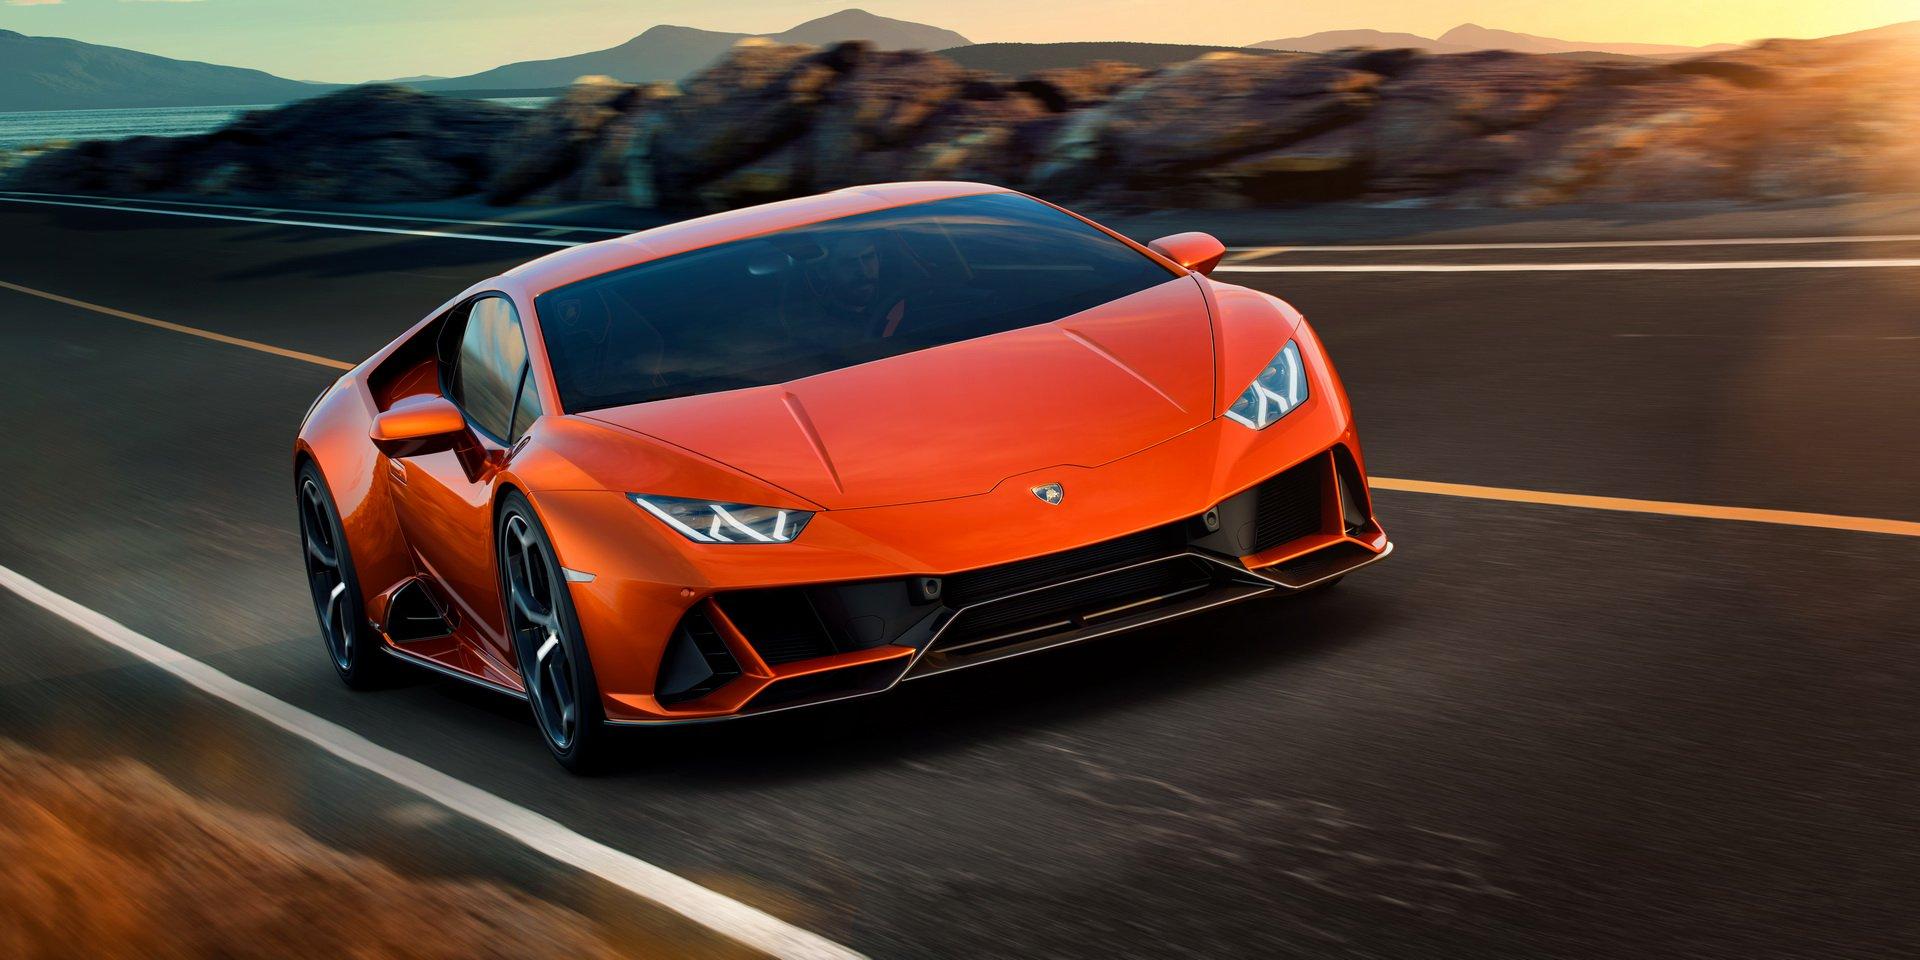 Lộ diện Lamborghini Huracan EVO 2020, giá từ 261.274 USD